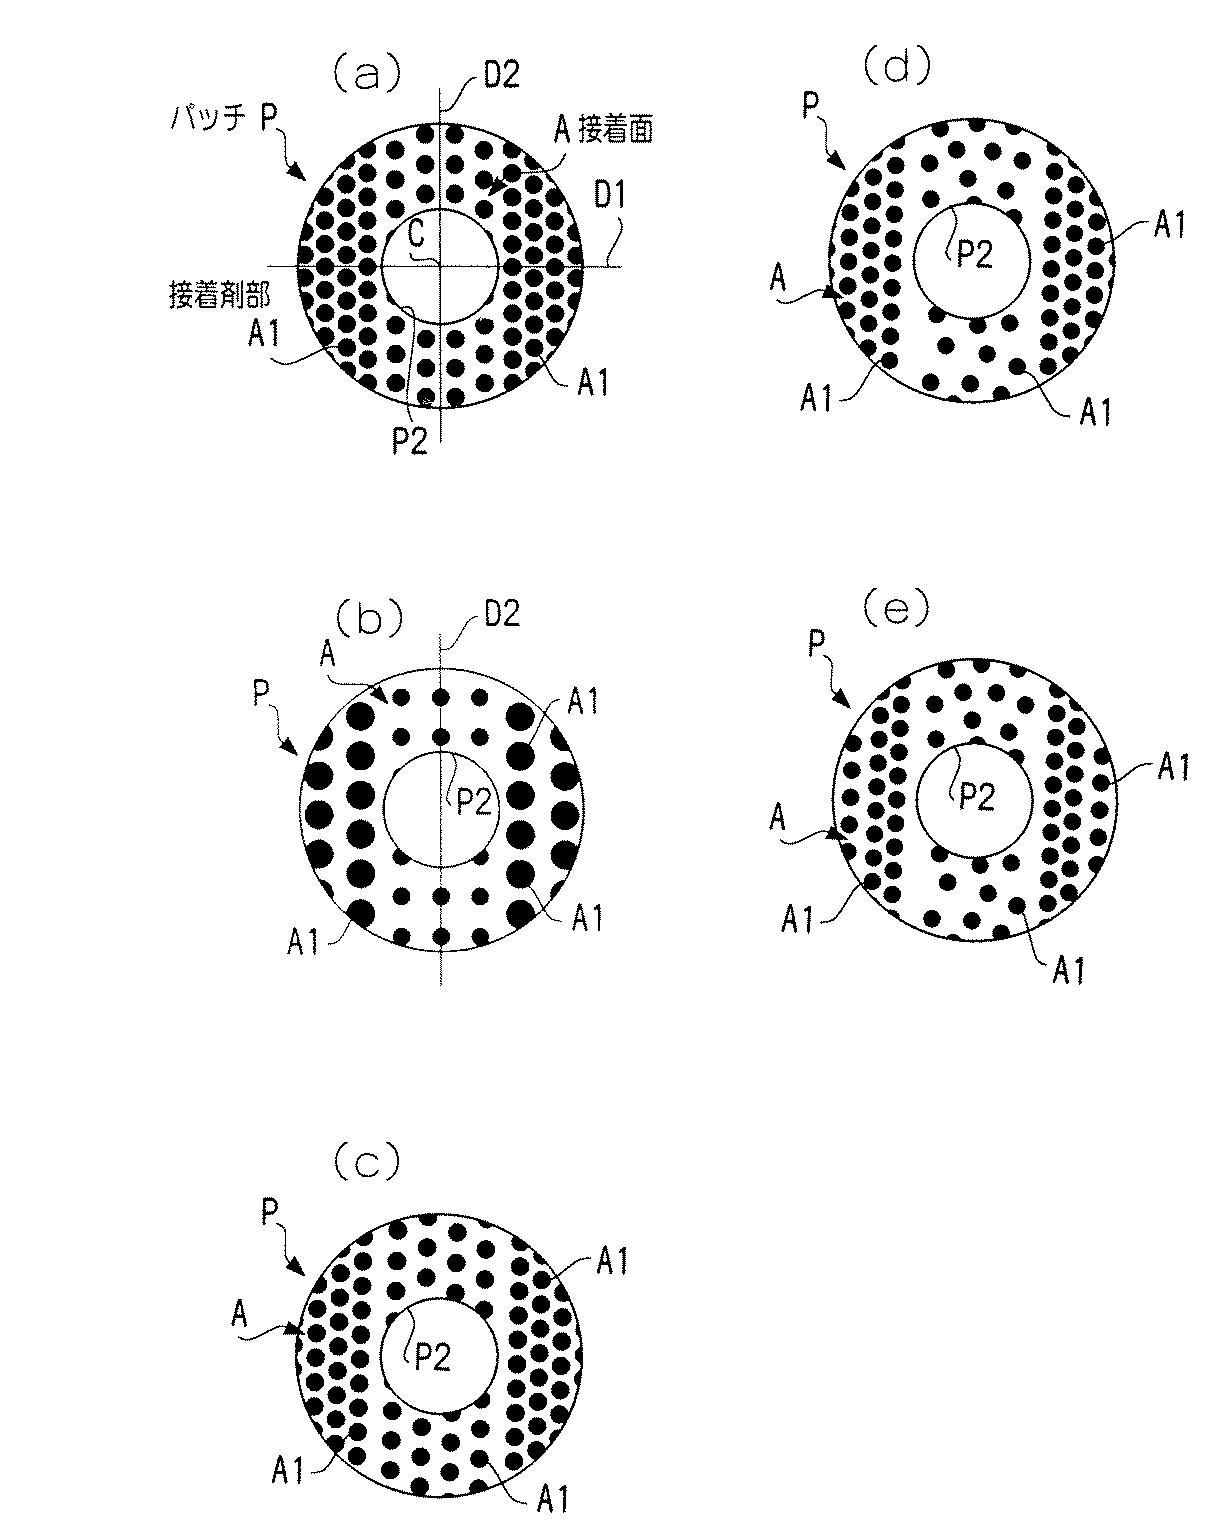 https://patentimages.storage.googleapis.com/JP5017689B2/0005017689.tif/7.png